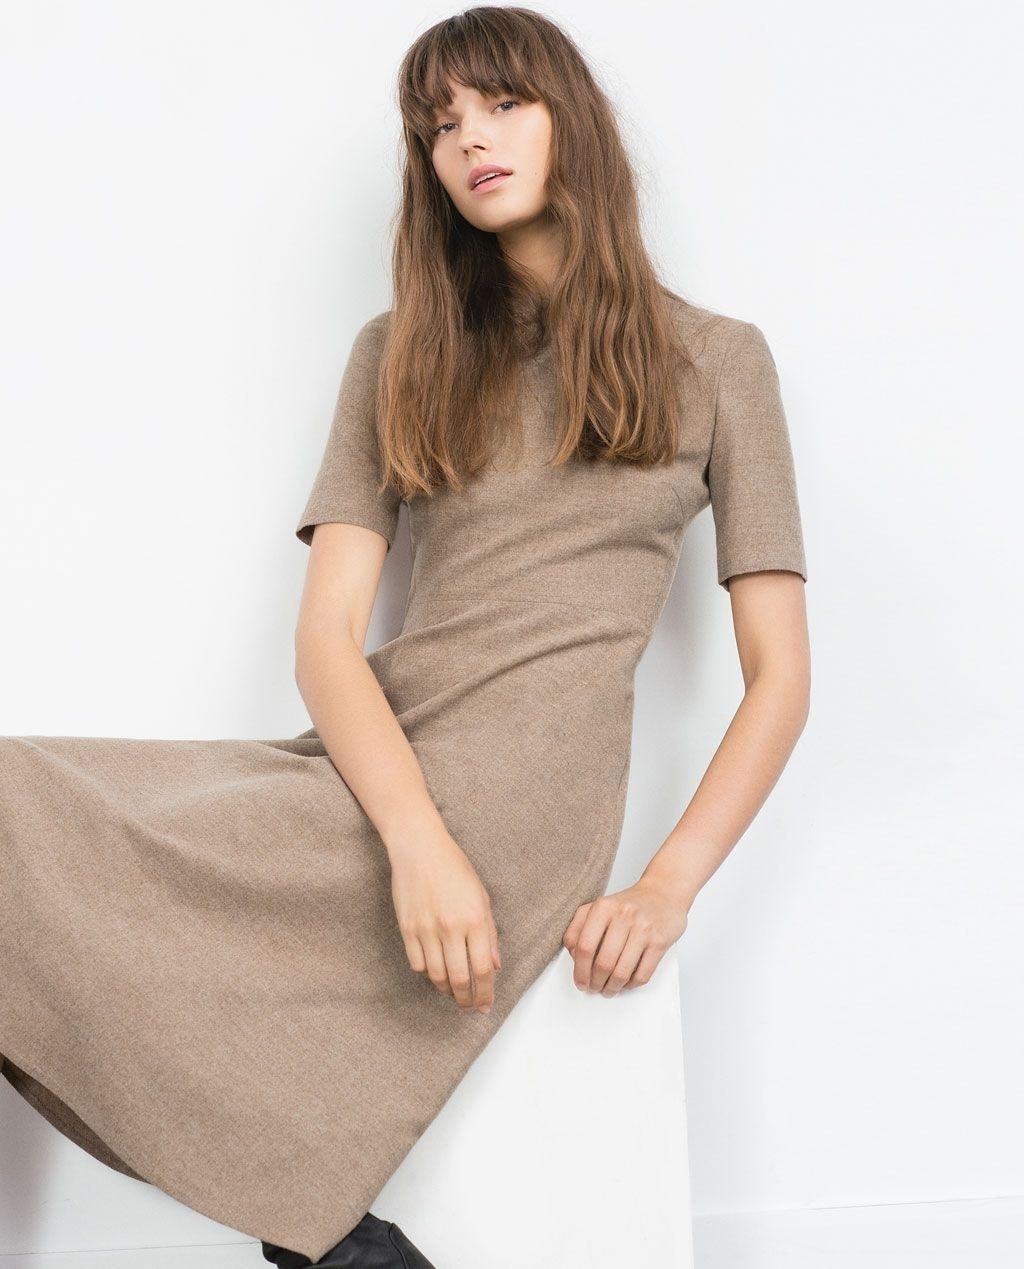 Abend Kreativ Kleid Mit Glockenrock StylishDesigner Genial Kleid Mit Glockenrock Vertrieb